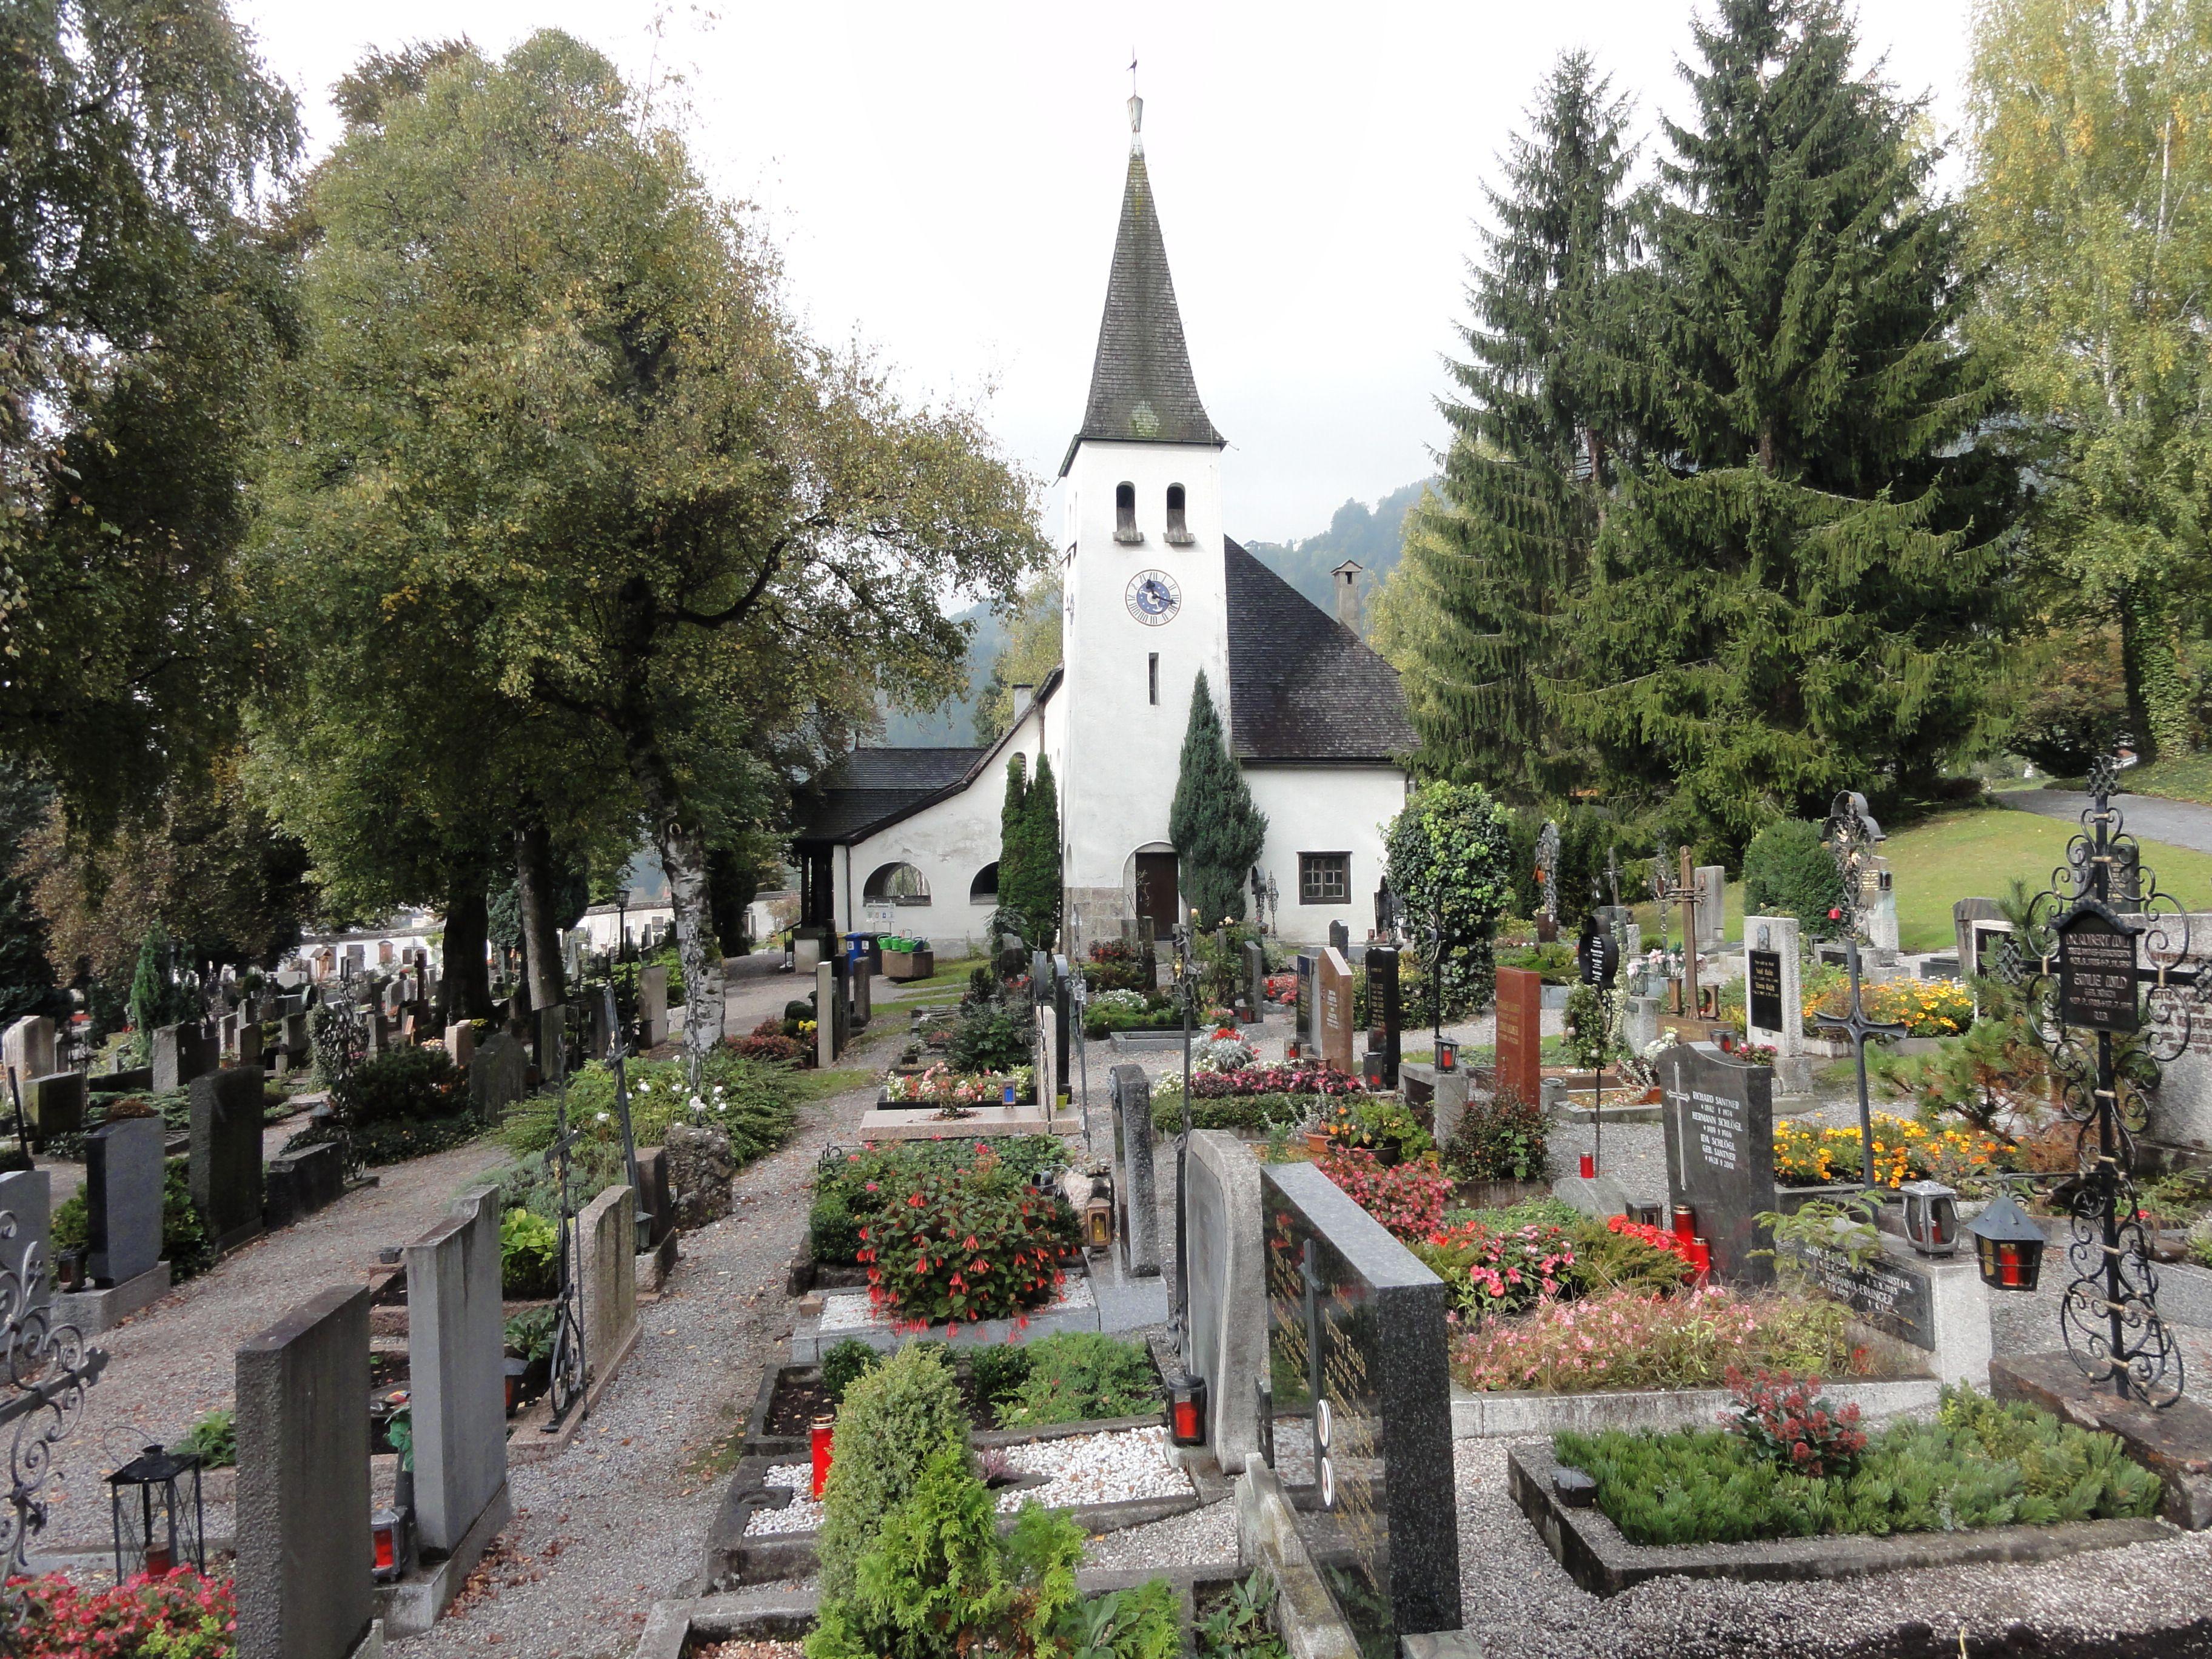 Friedhof_Mühlau1.JPG (3648×2736)